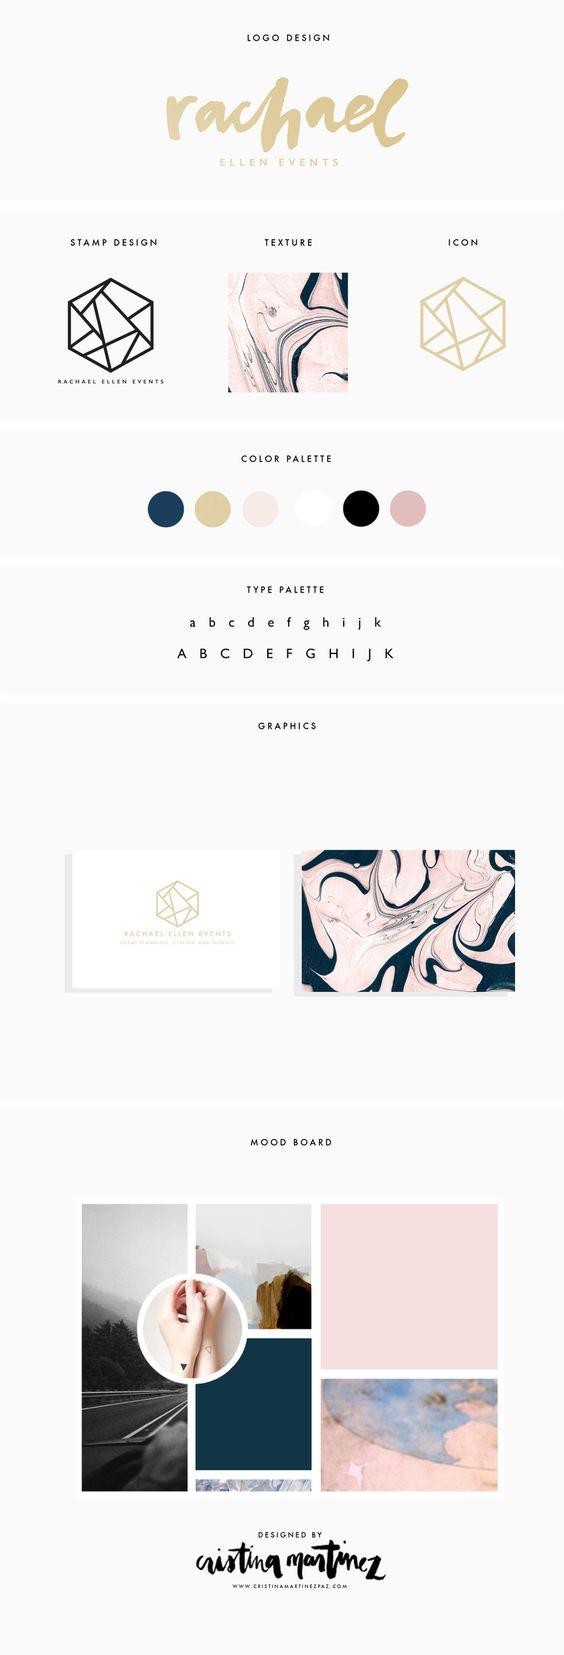 RACHAEL ELLEN EVENTS — CRISTINA MARTINEZ - design - branding board